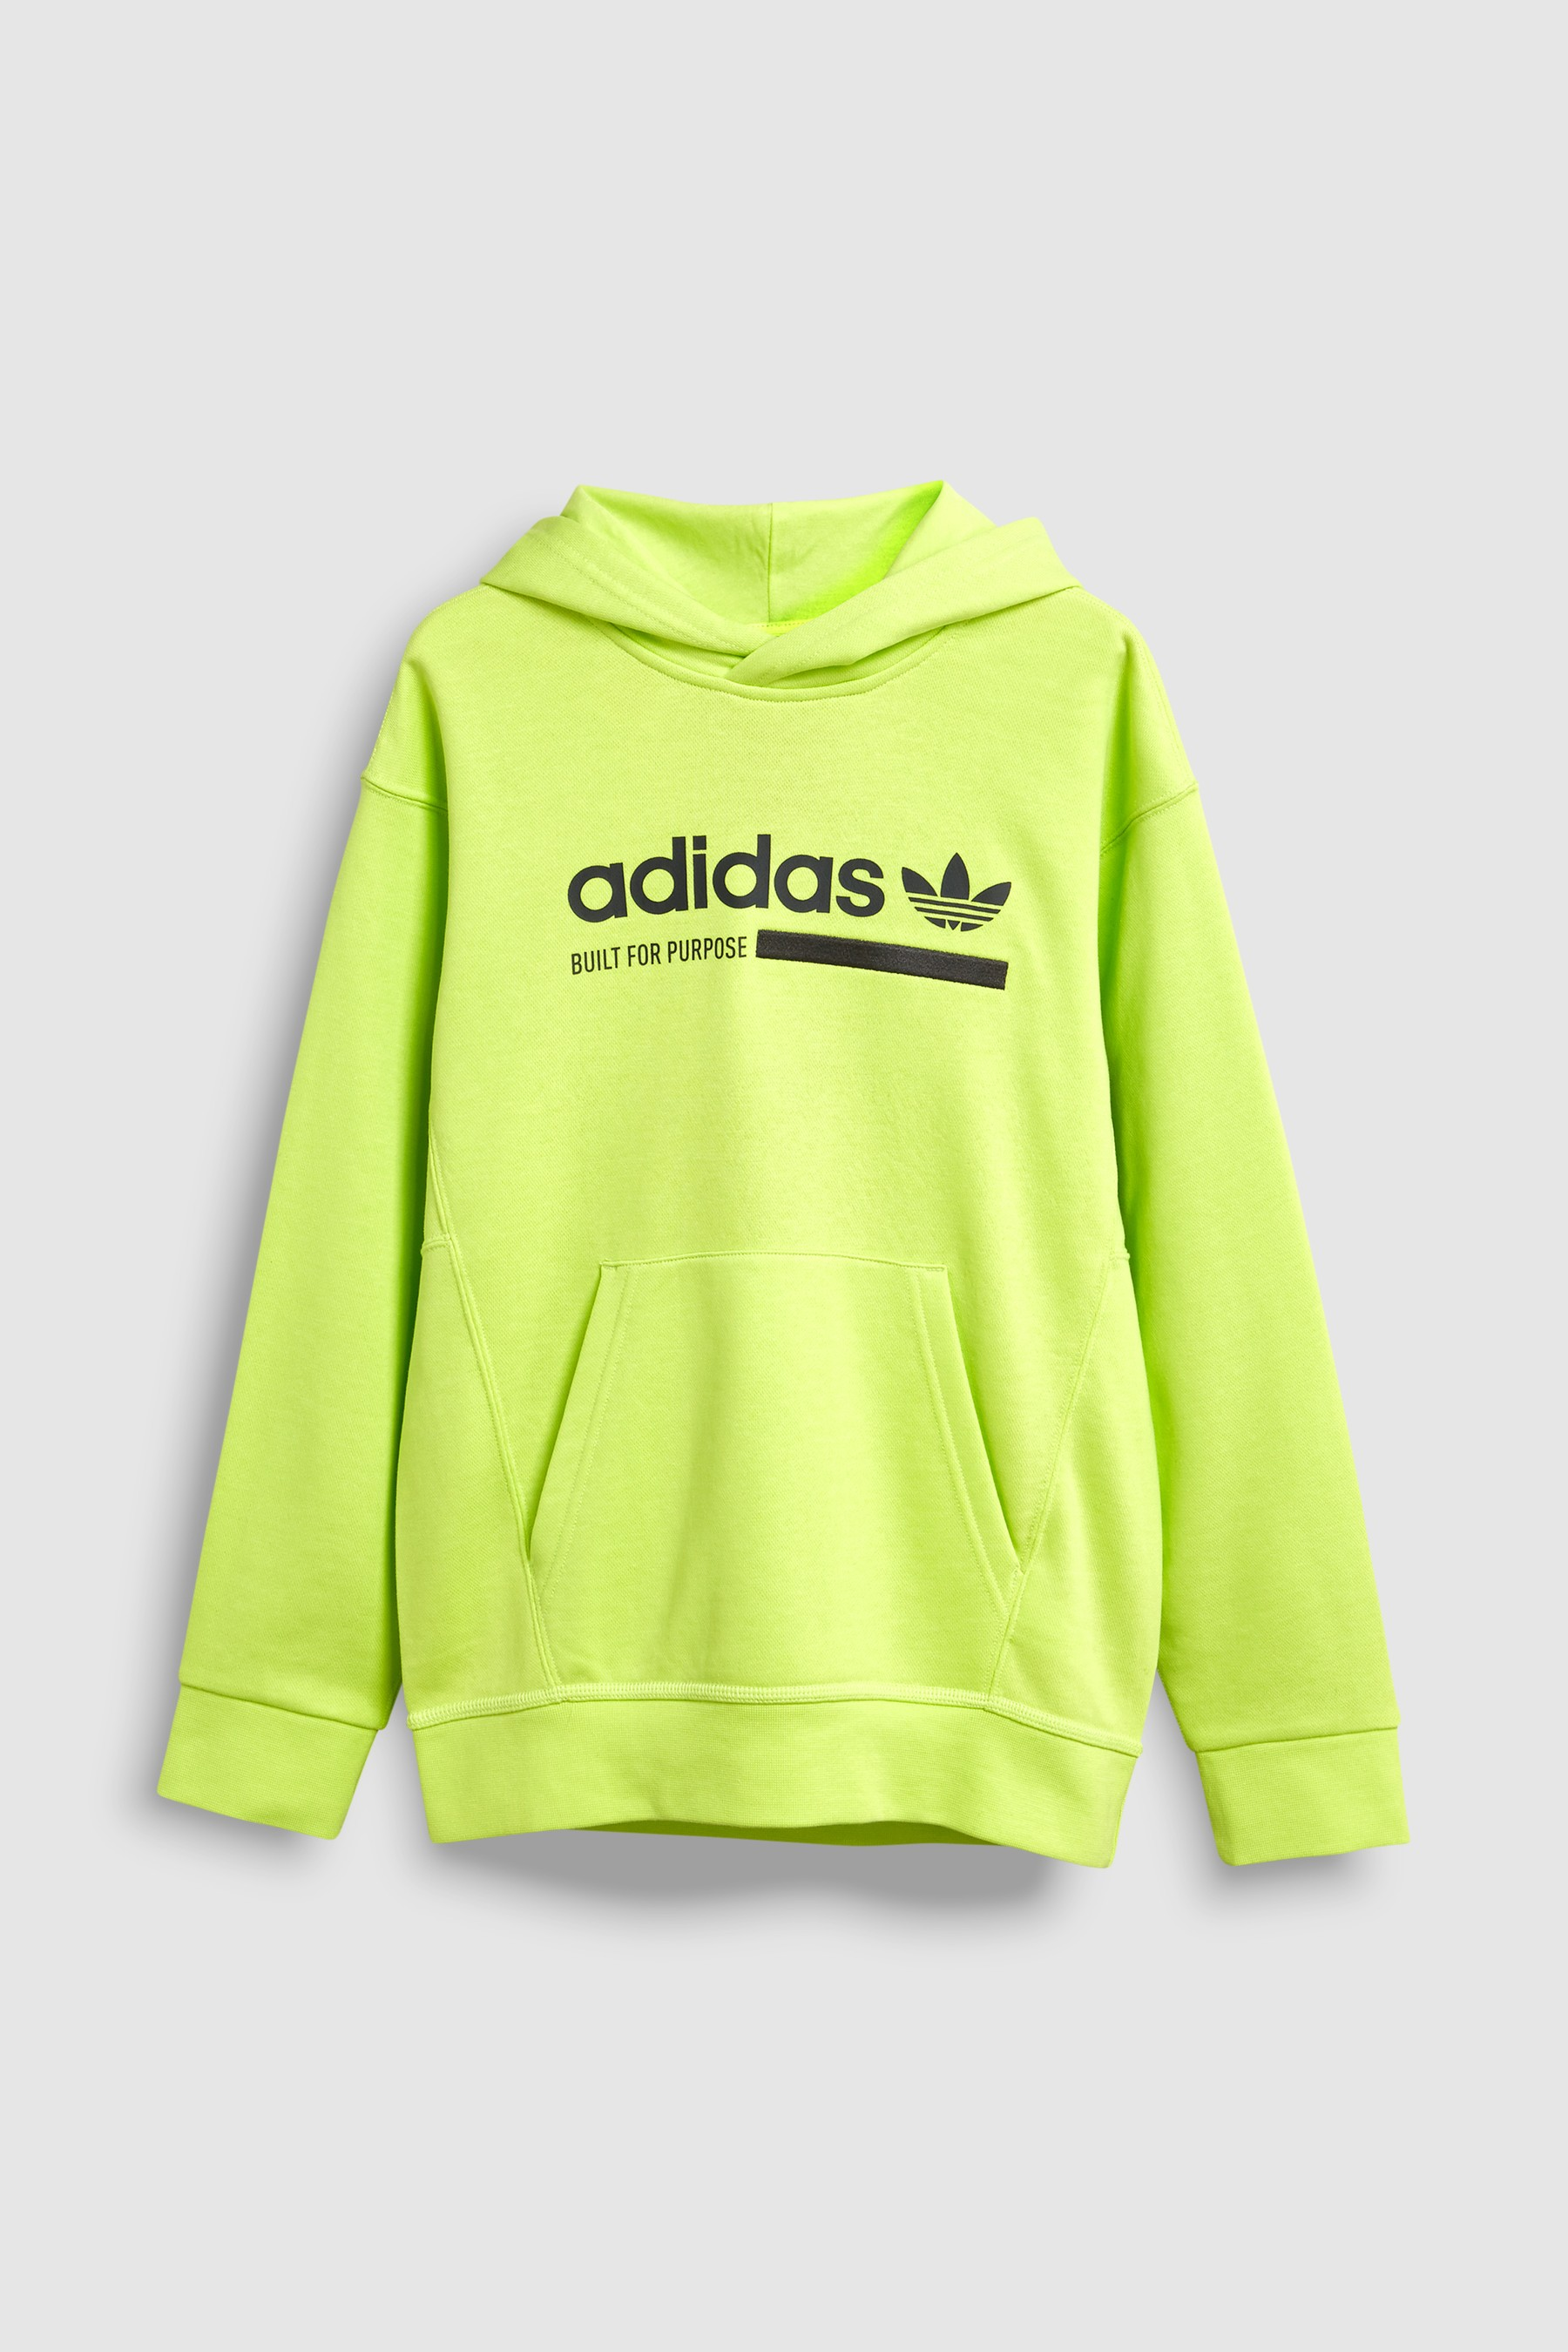 Adidas Boys Originals Kaval Hoodie